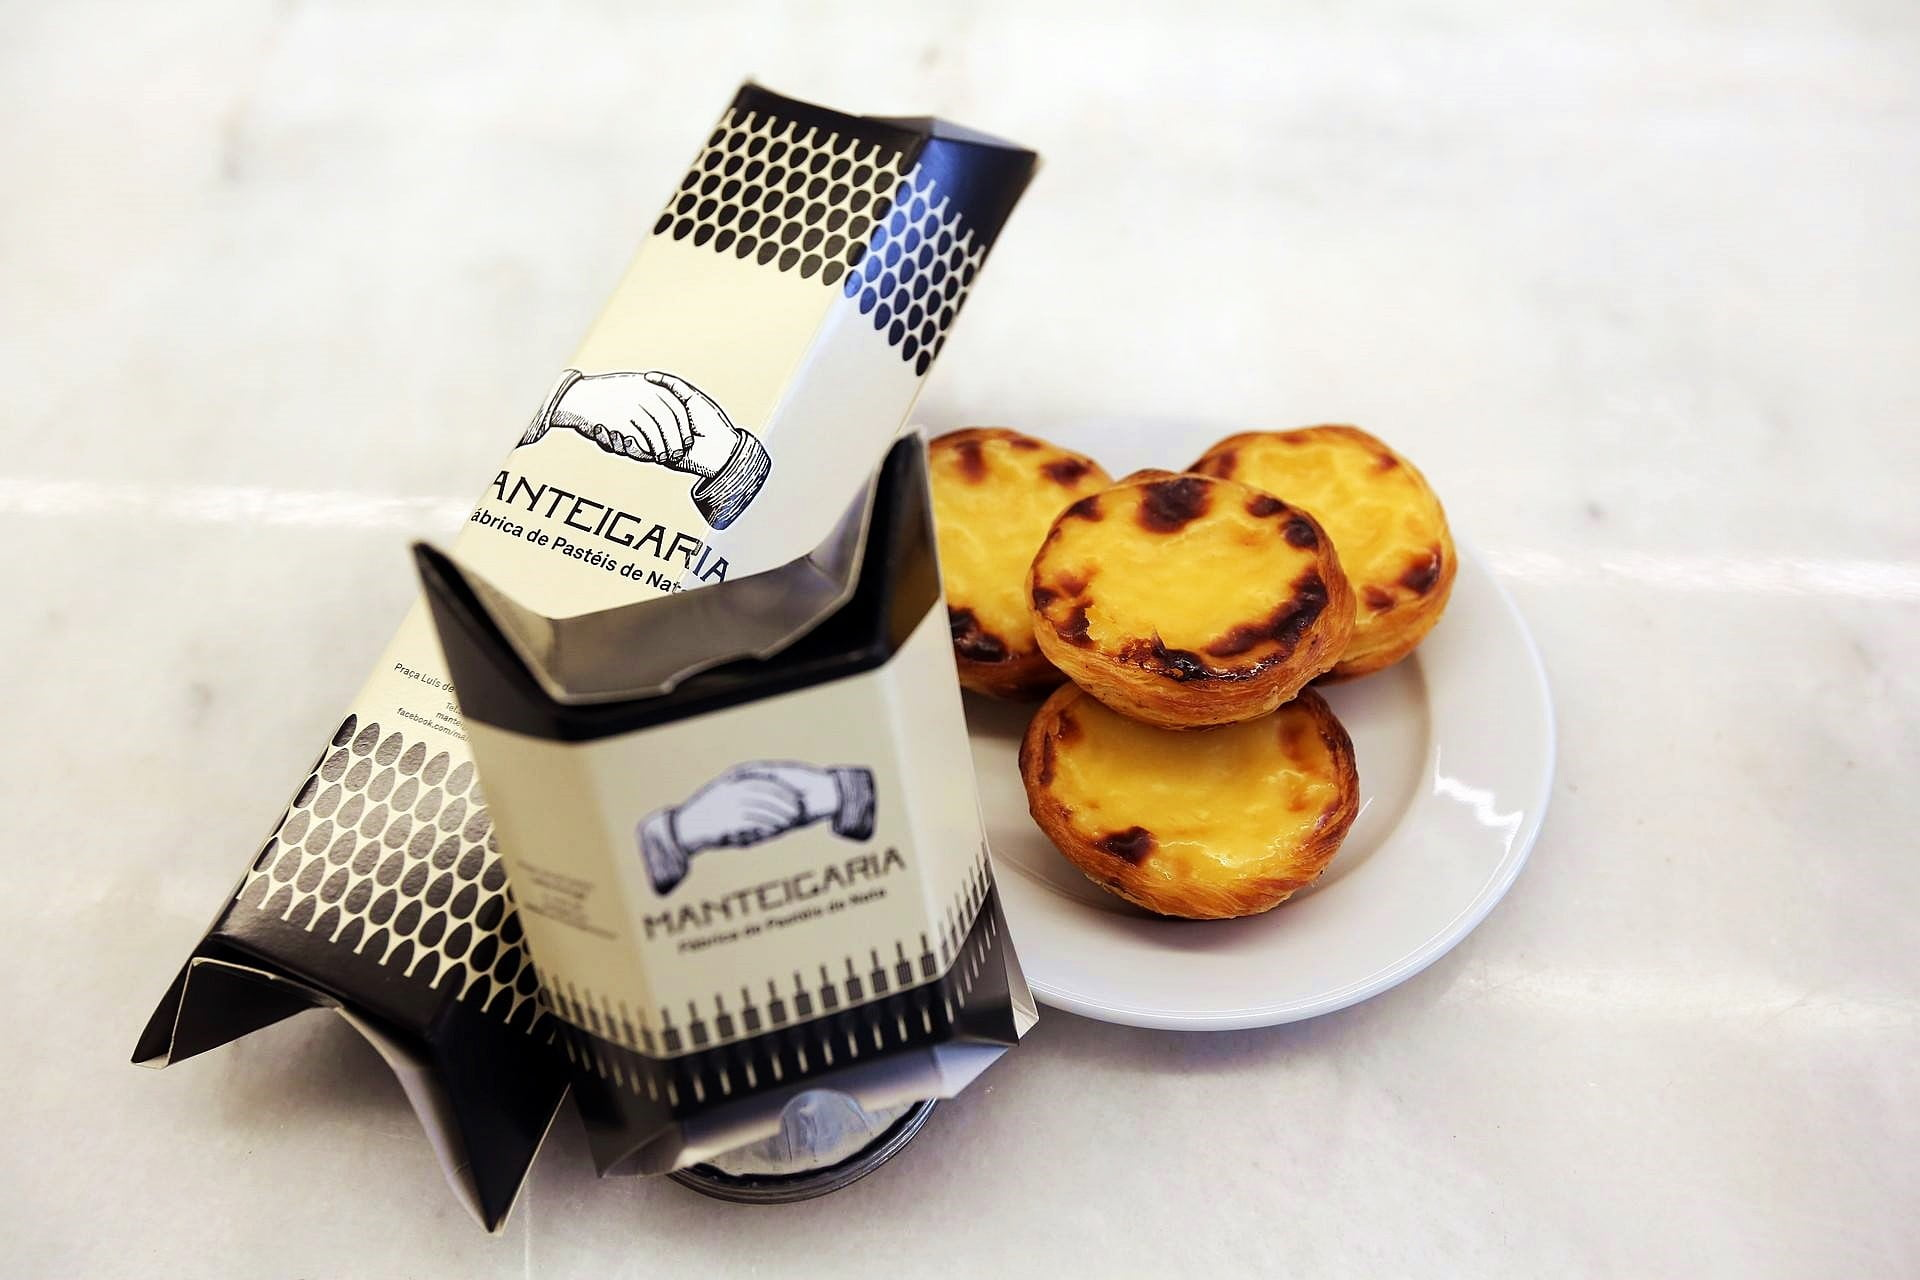 Image result for manteigaria lisbon